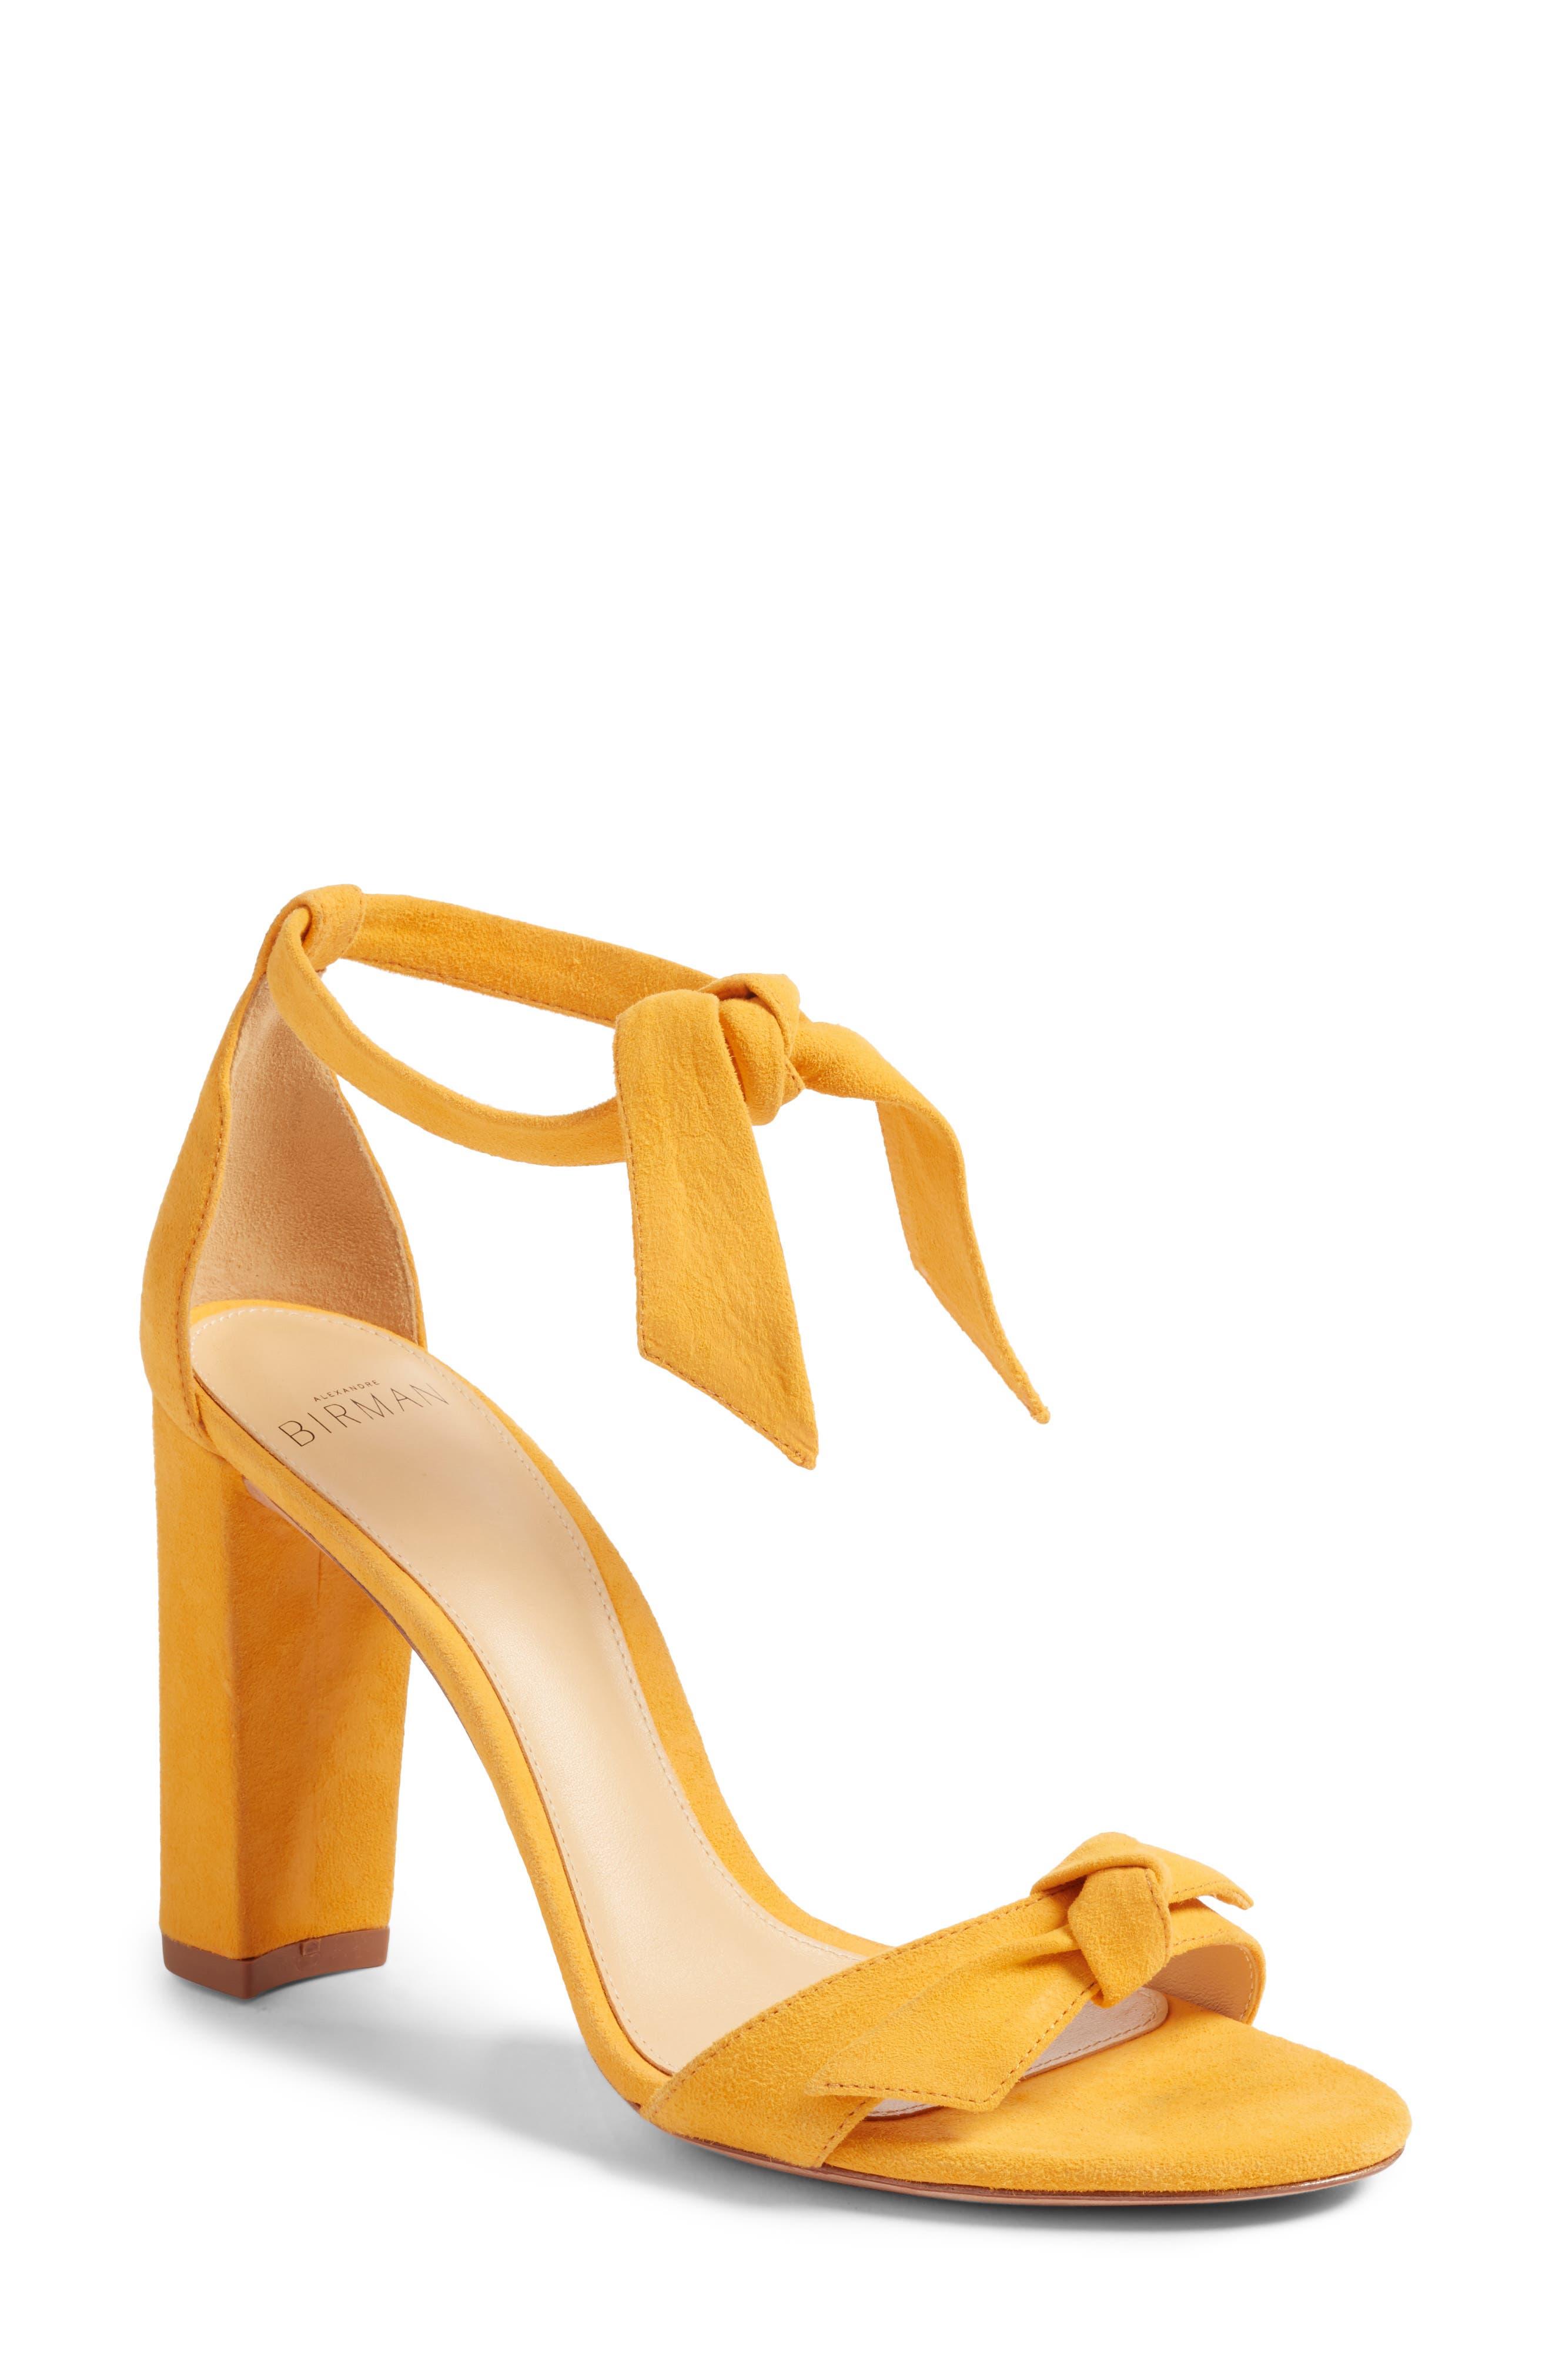 ALEXANDRE BIRMAN Clarita Knot Sandal, Main, color, SUNFLOWER